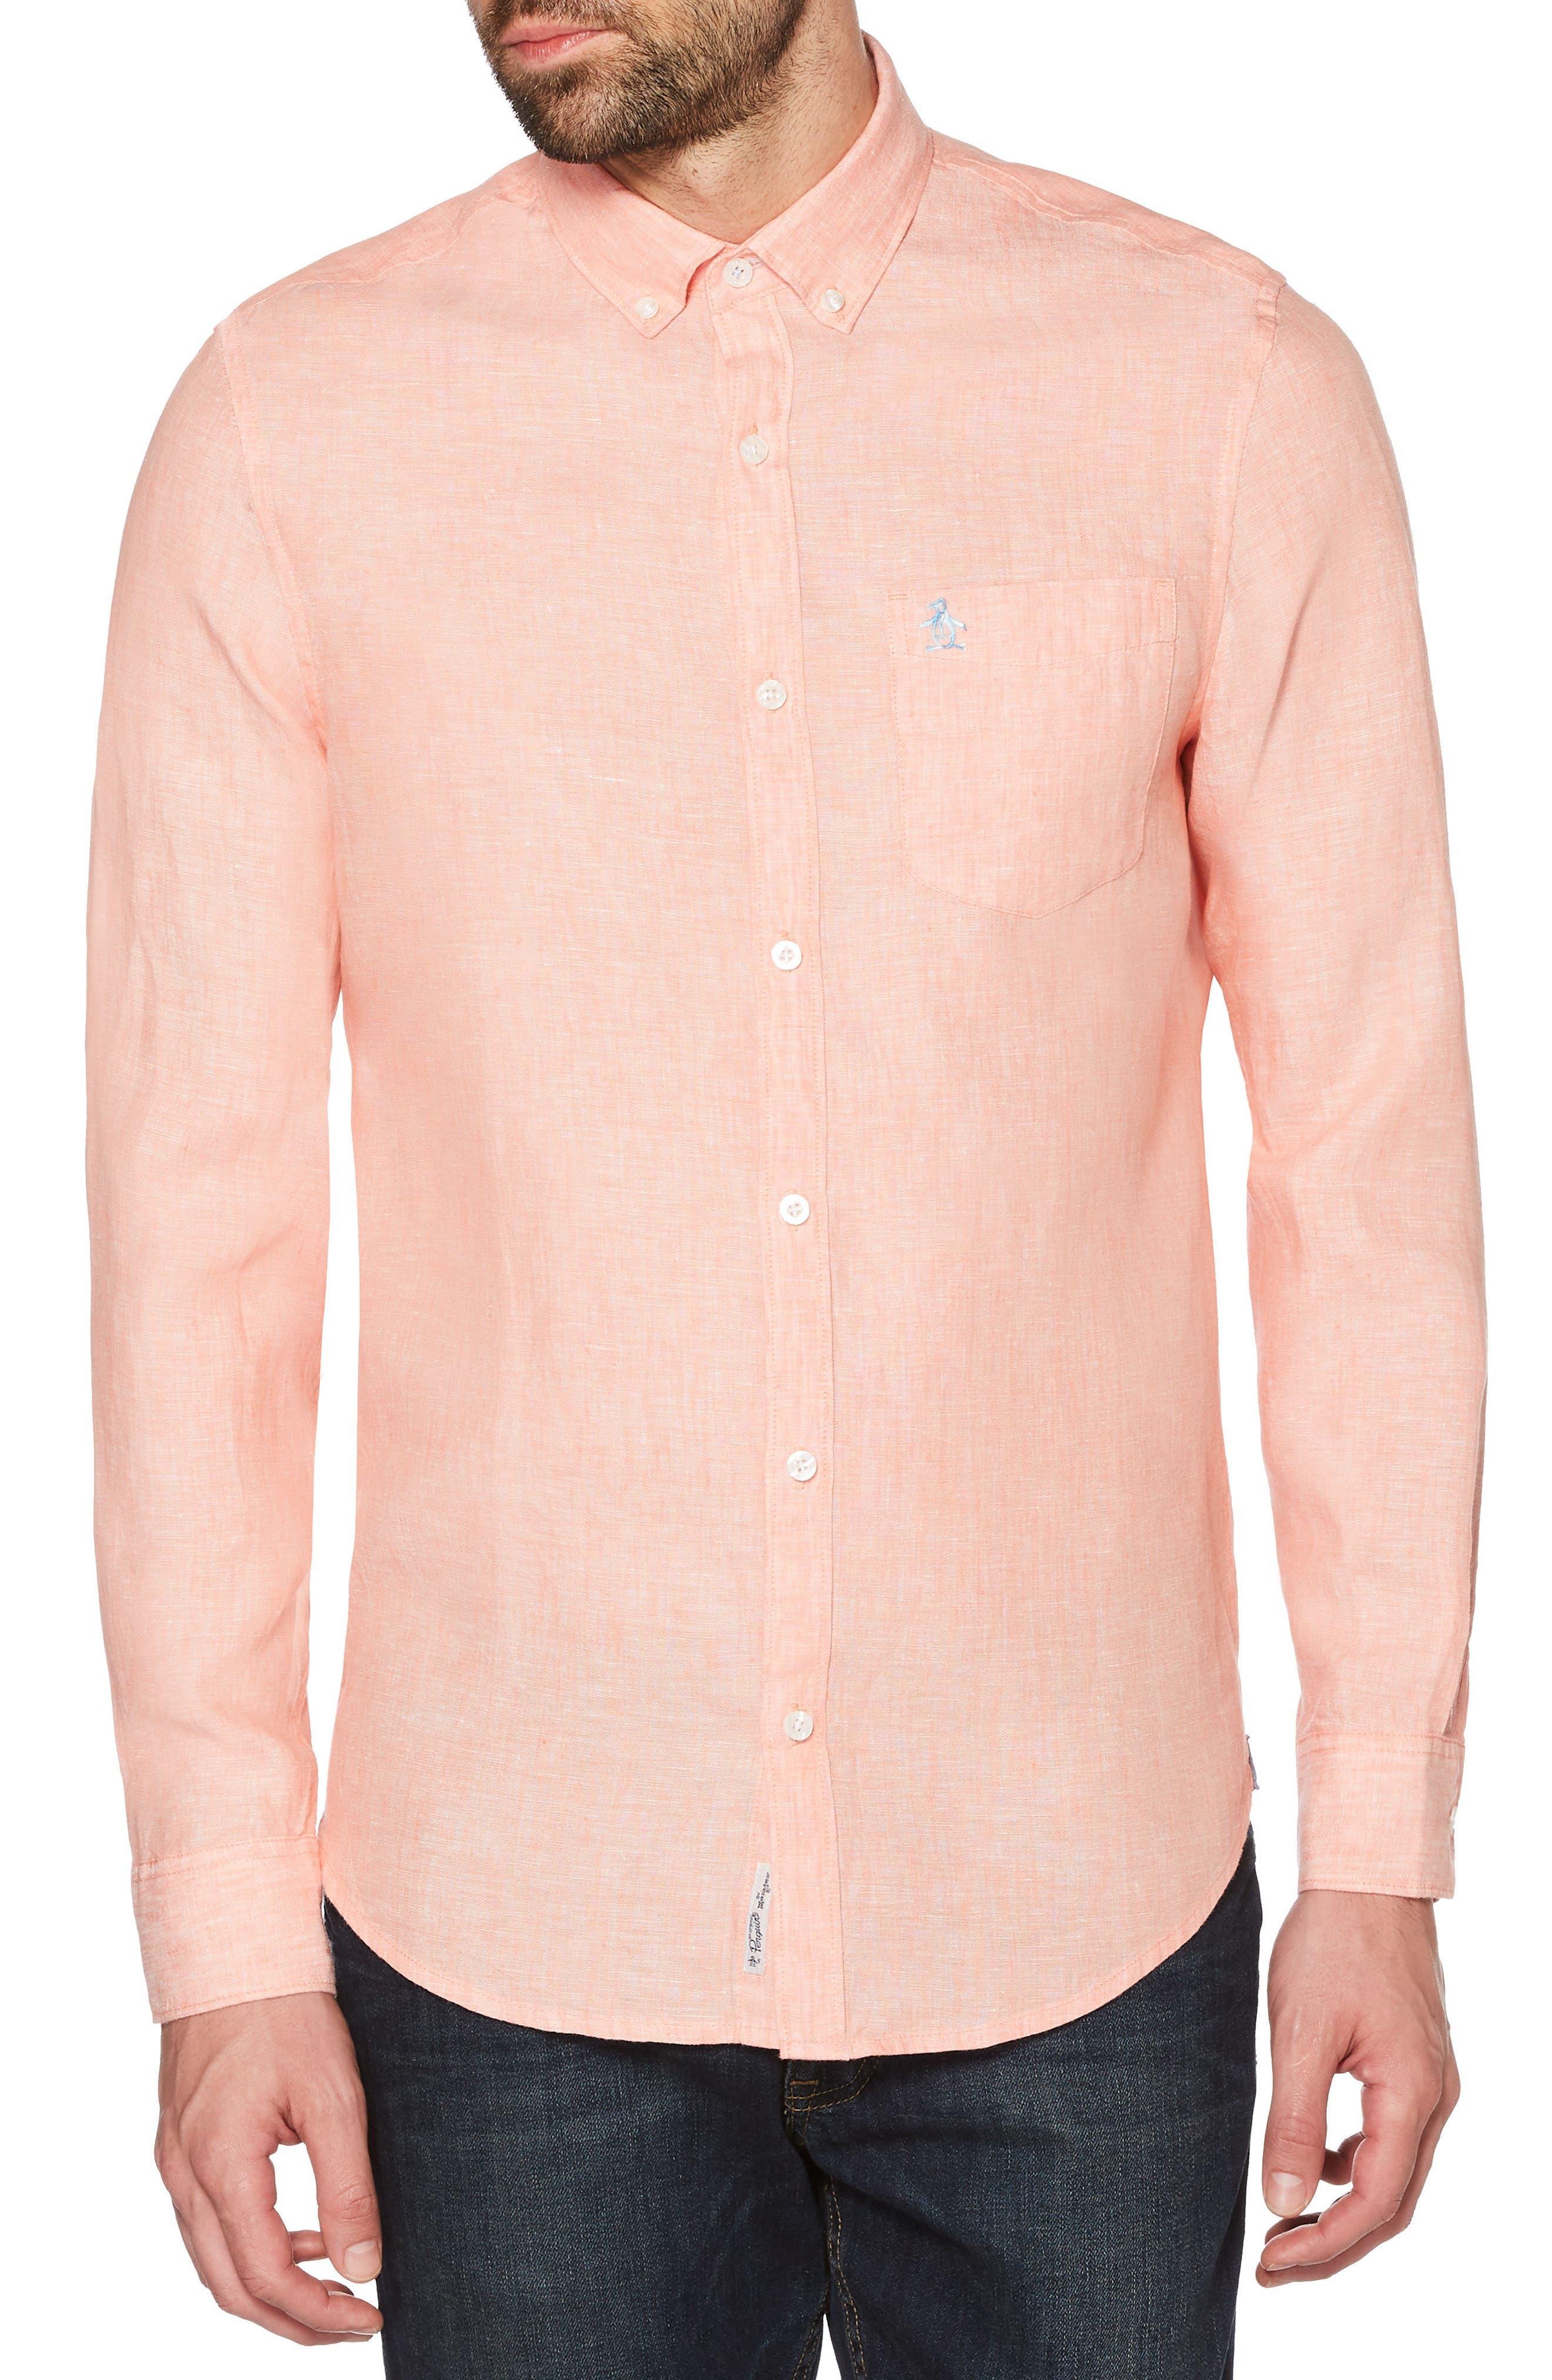 Nep Woven Shirt,                         Main,                         color, Peach Amber